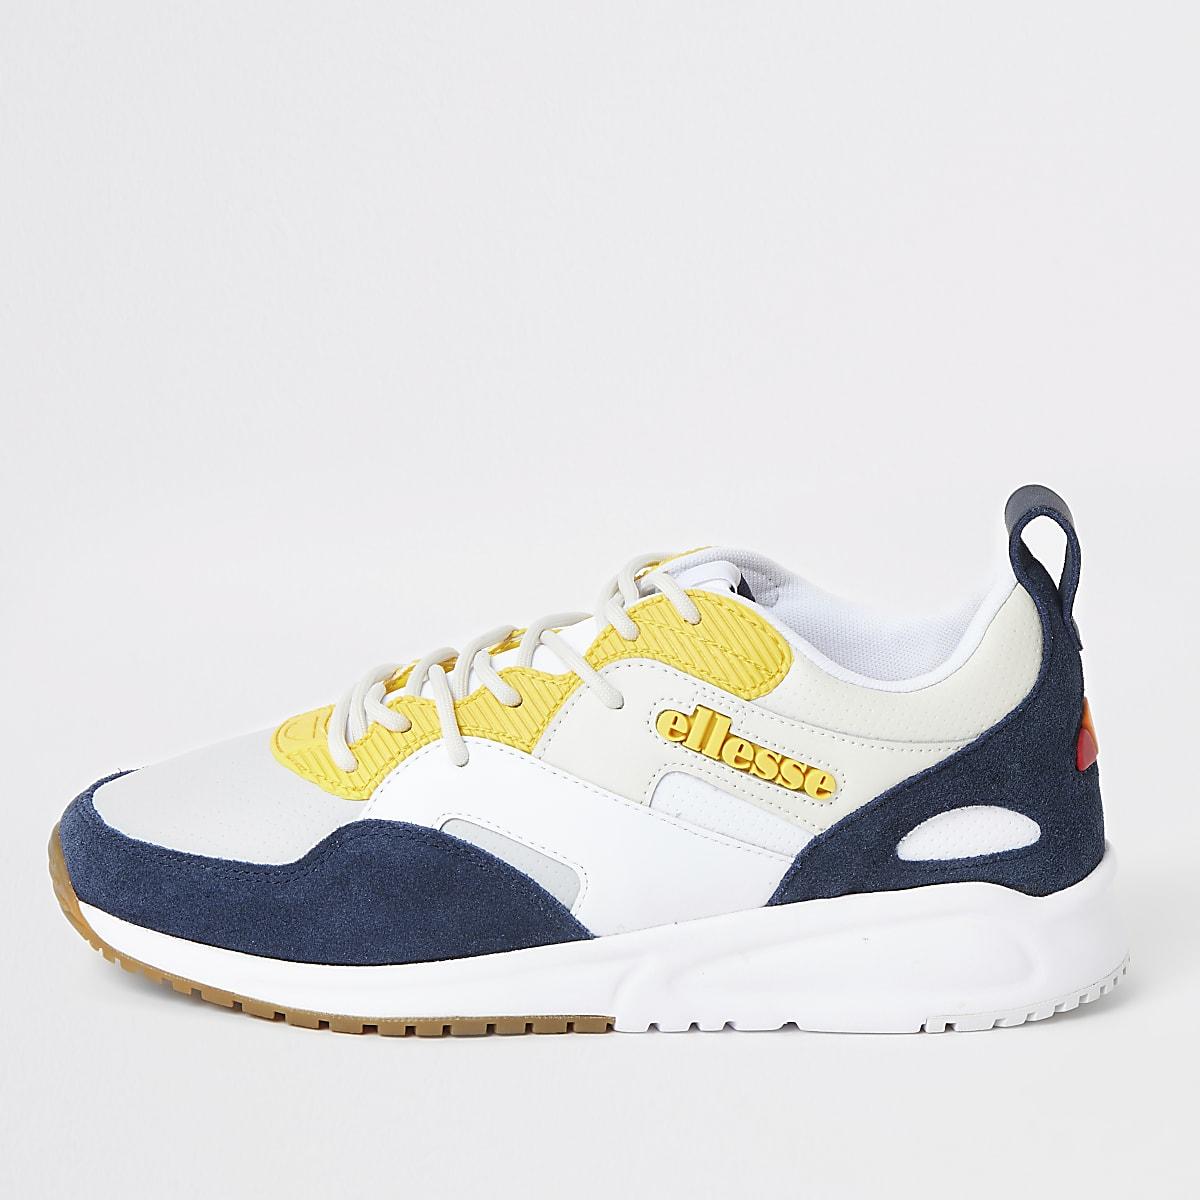 Ellesse Potenza Lunar - Witte leren sneakers